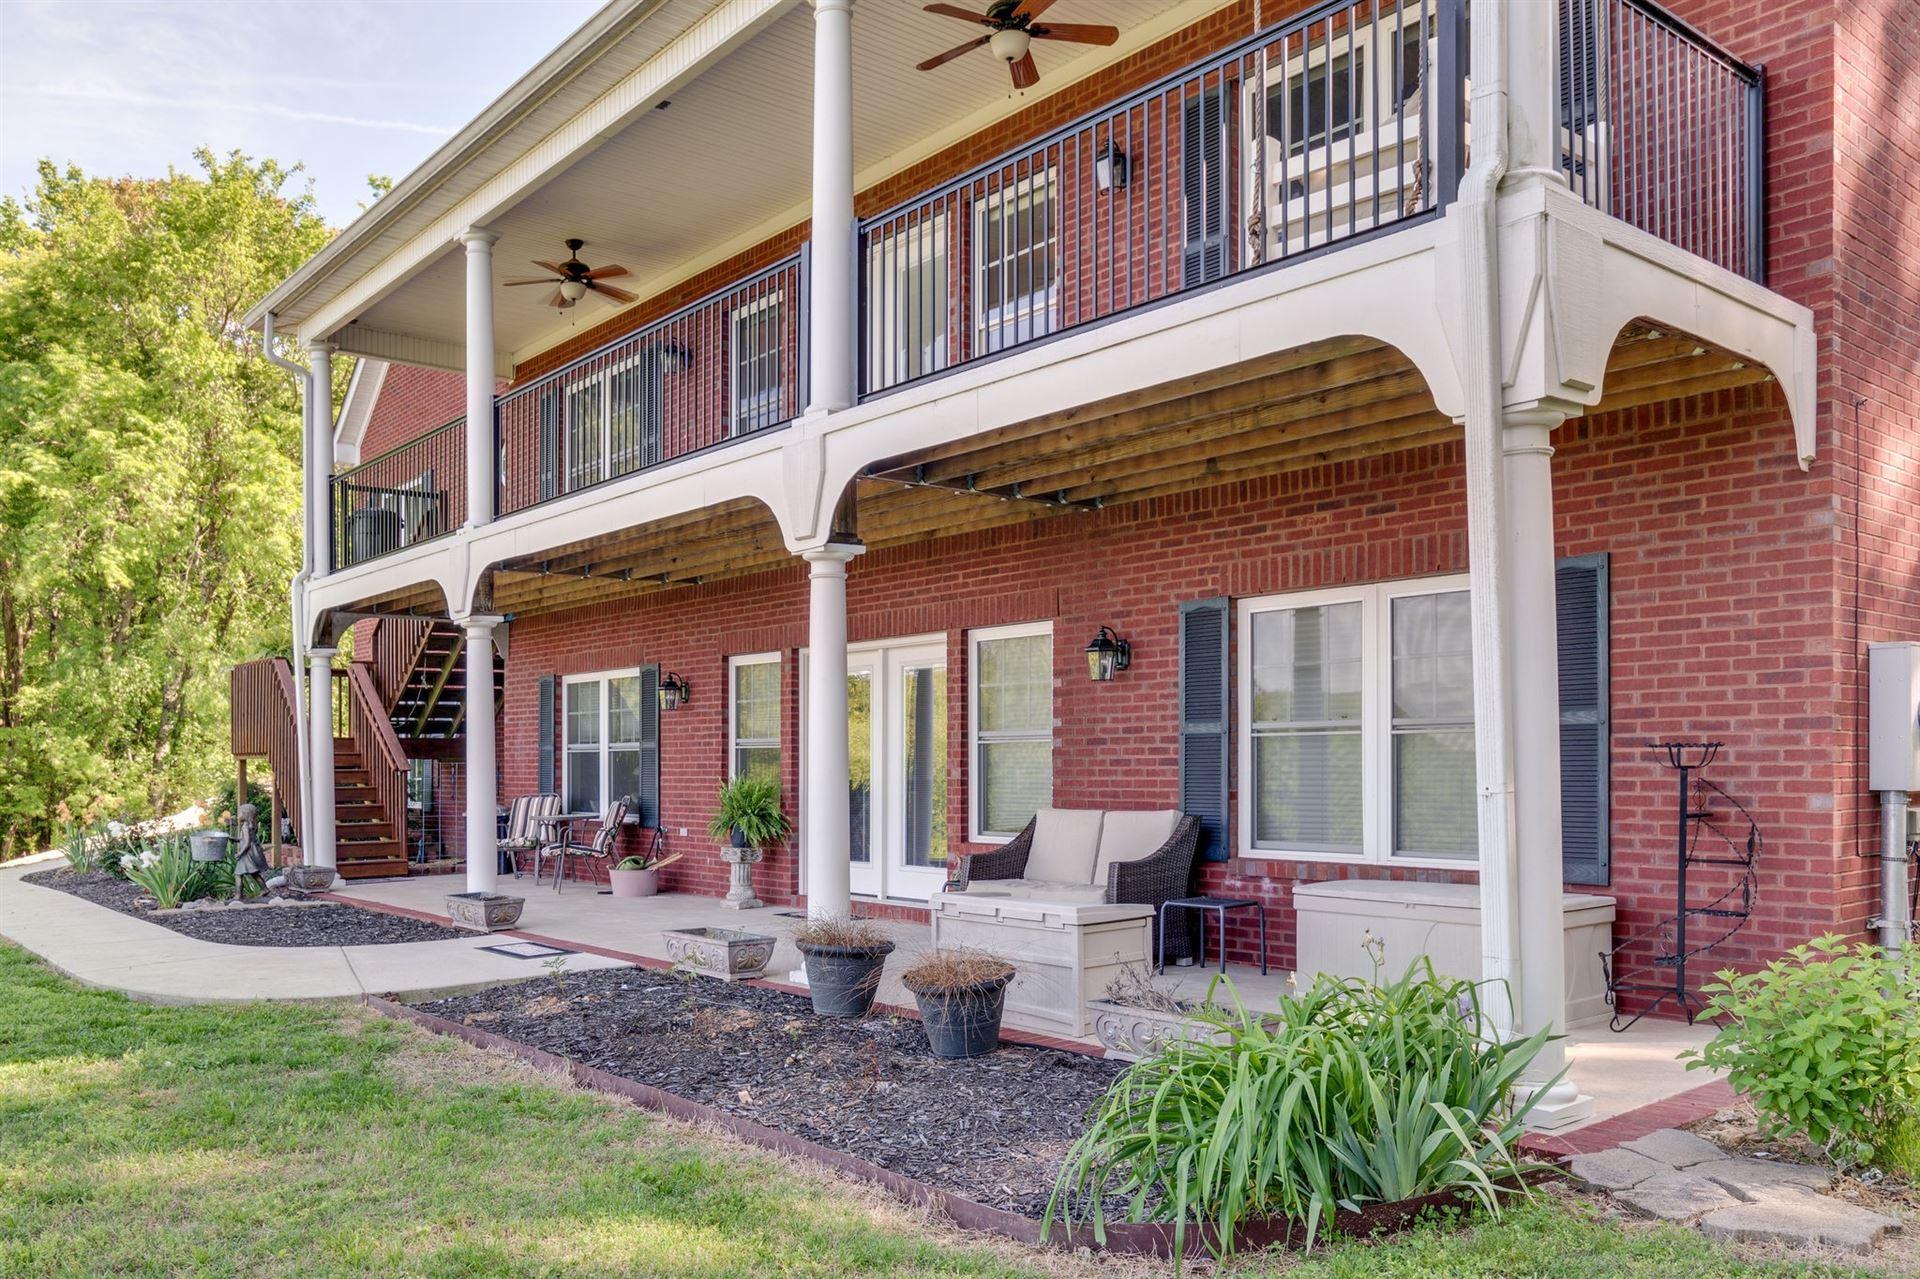 2015 Phinney Murphy Rd, Culleoka, TN 38451 - MLS#: 2258994